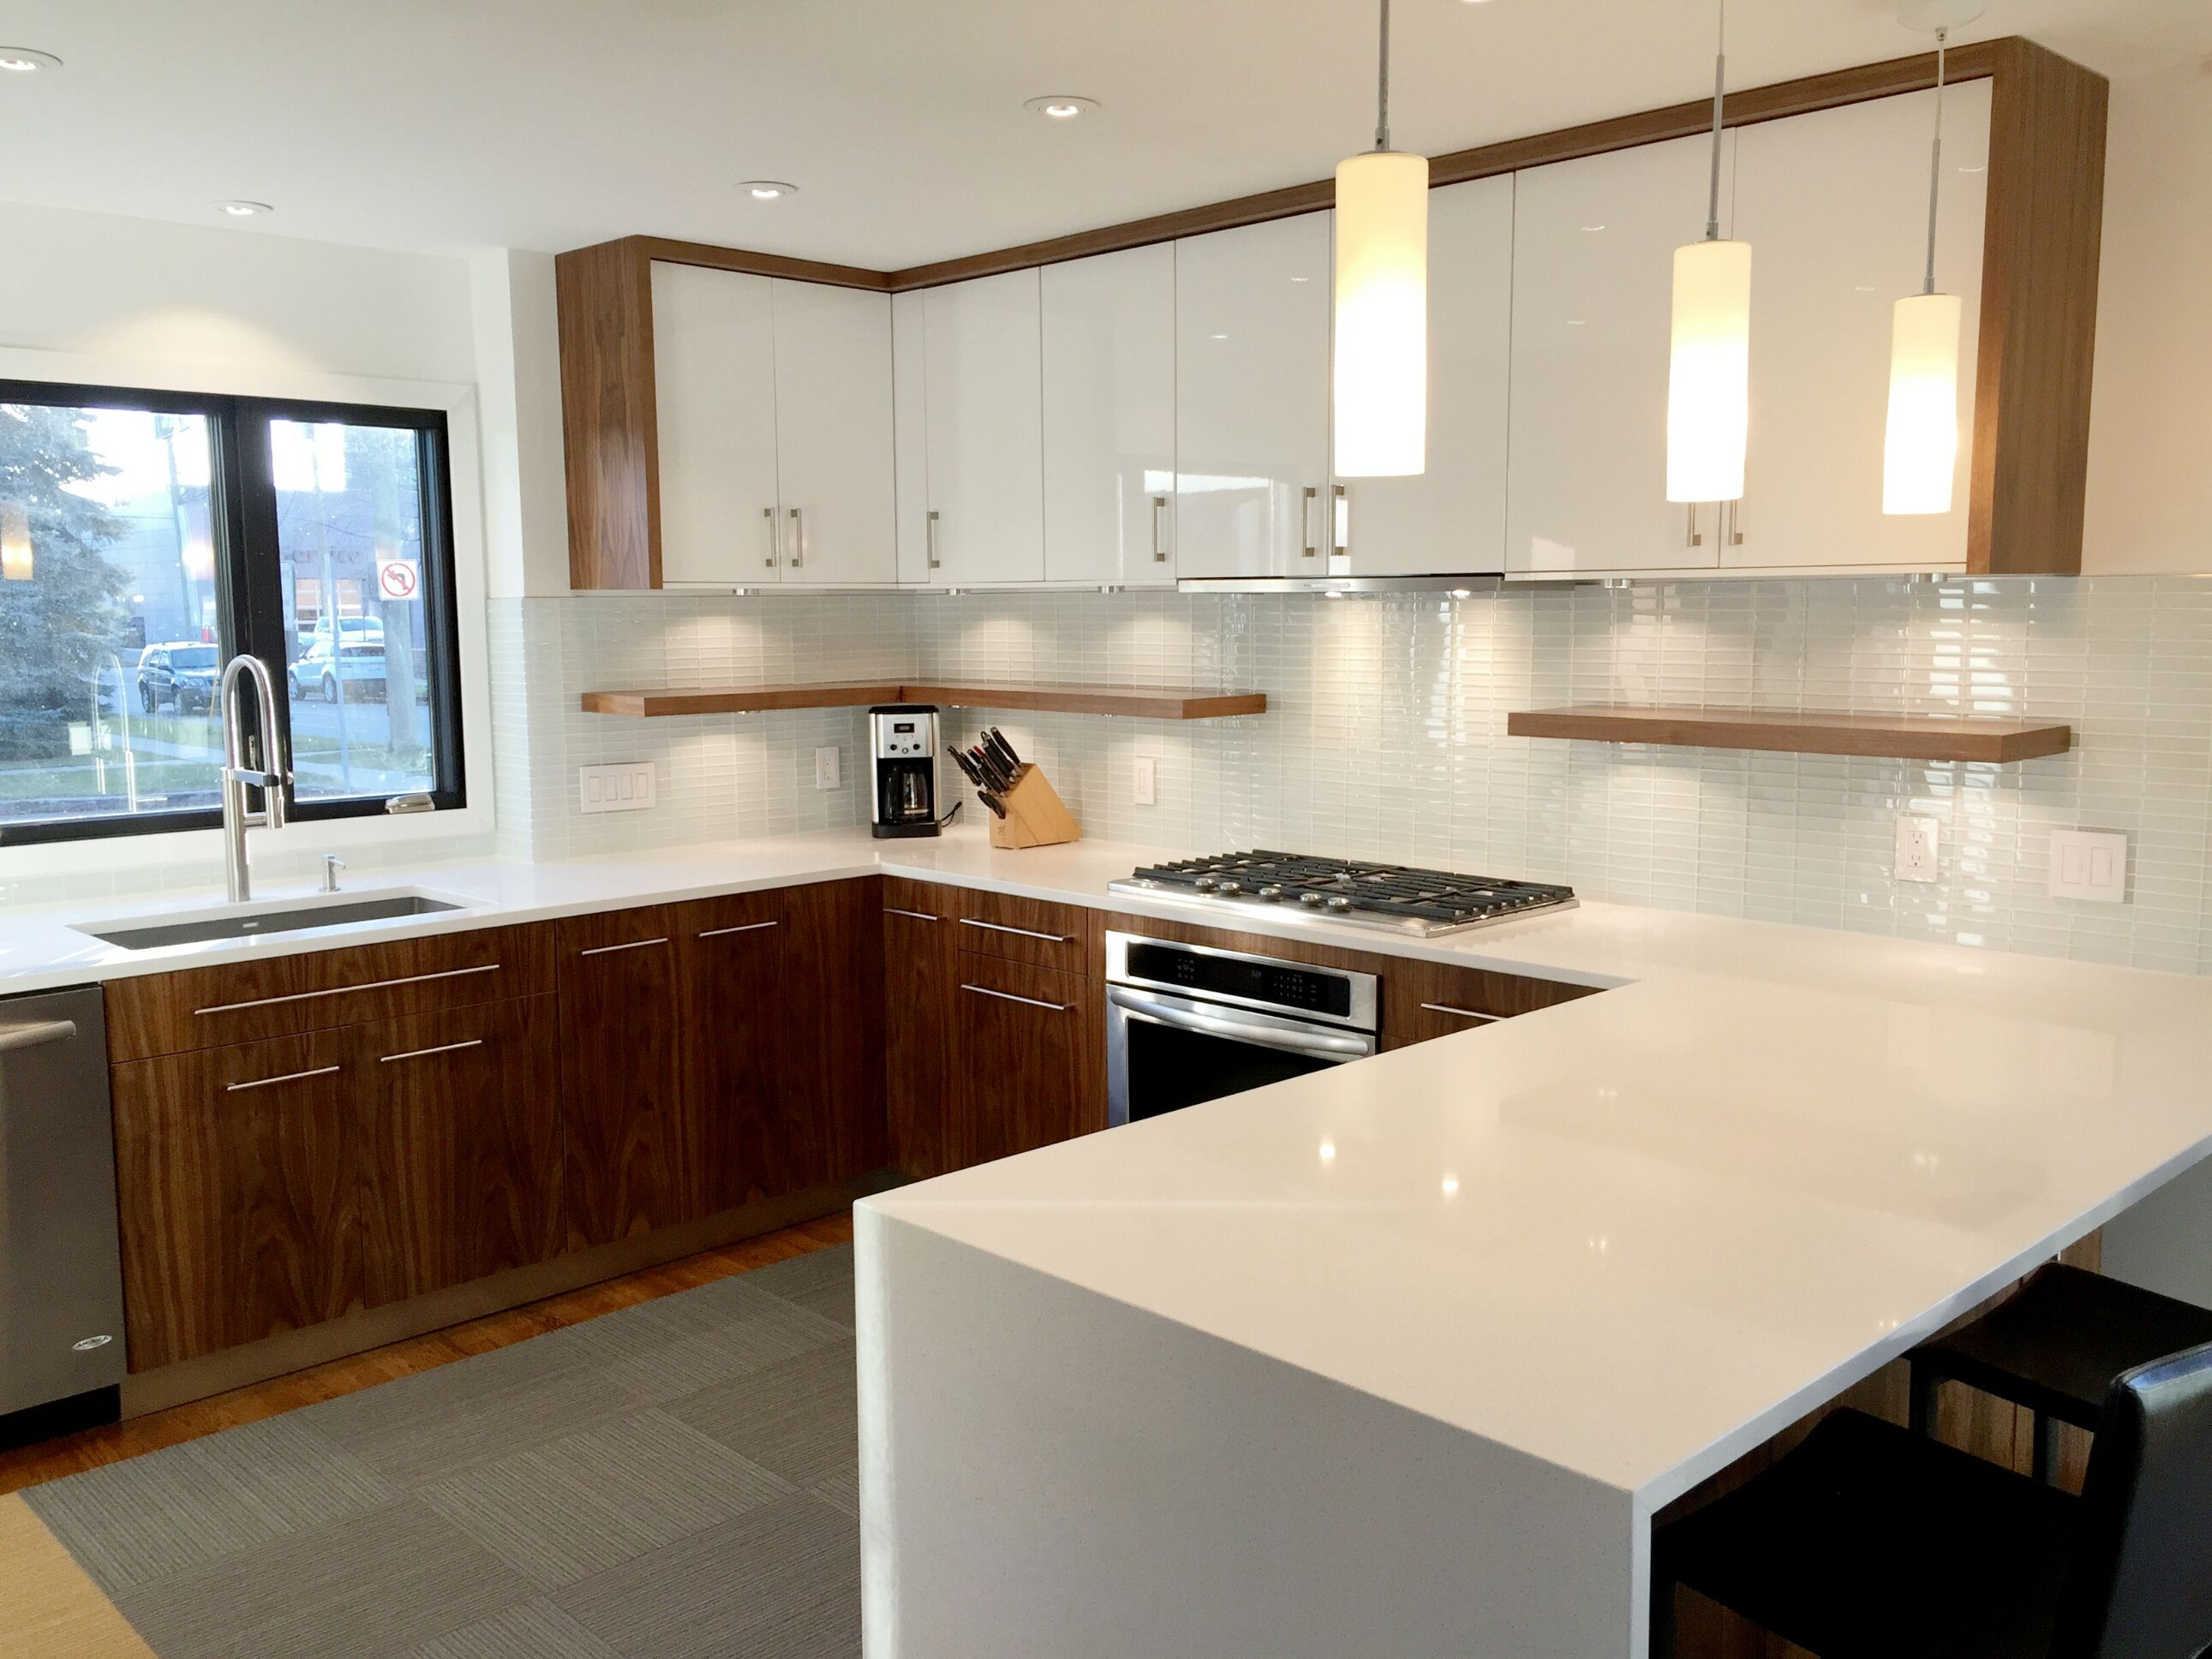 ikea kitchens cabinets kitchen orlando with semihandmade flatsawn walnut fronts